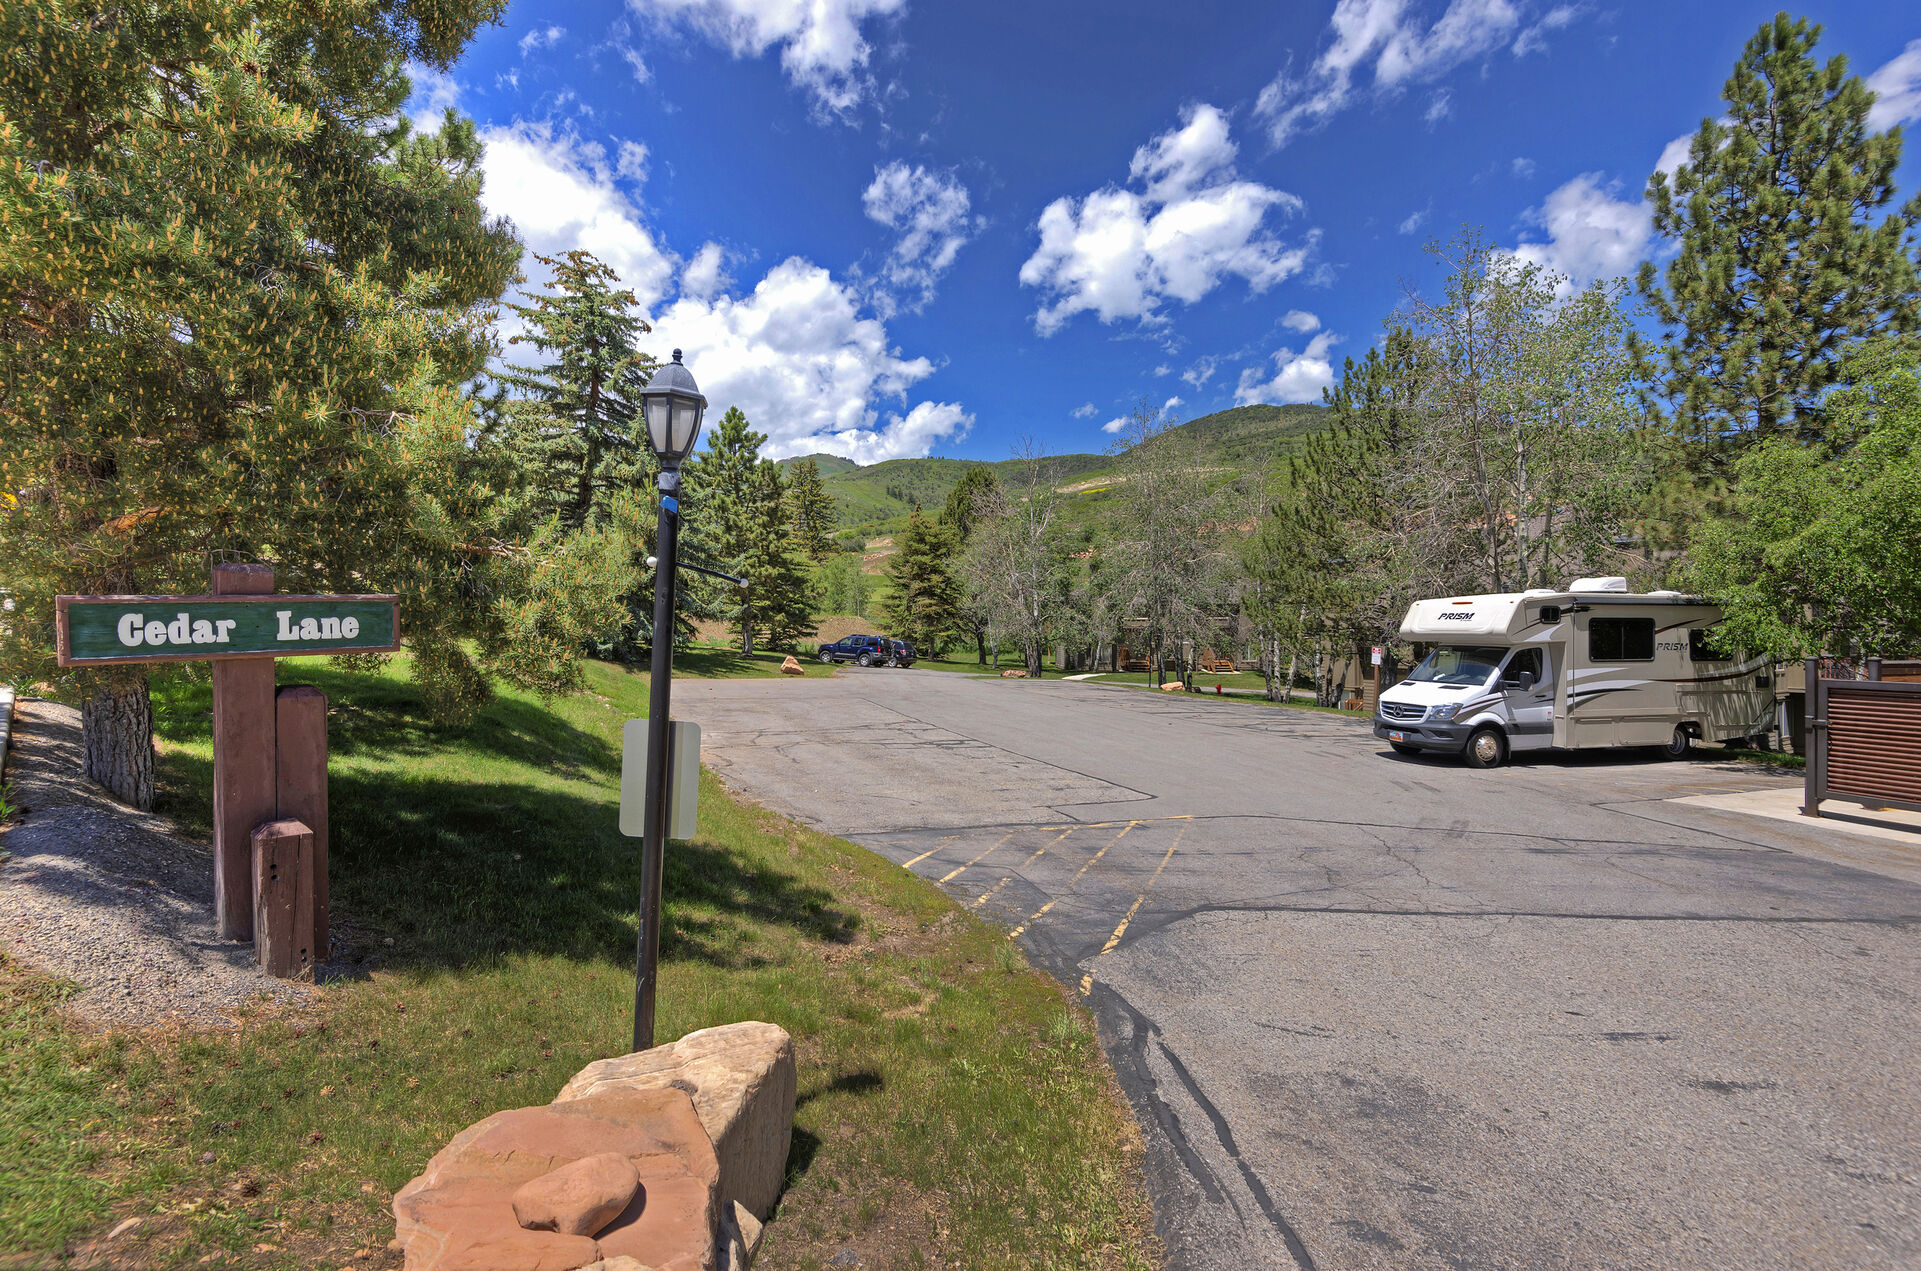 Cedar Lane Parking Lot - Unassigned Parking for Two Vehicles